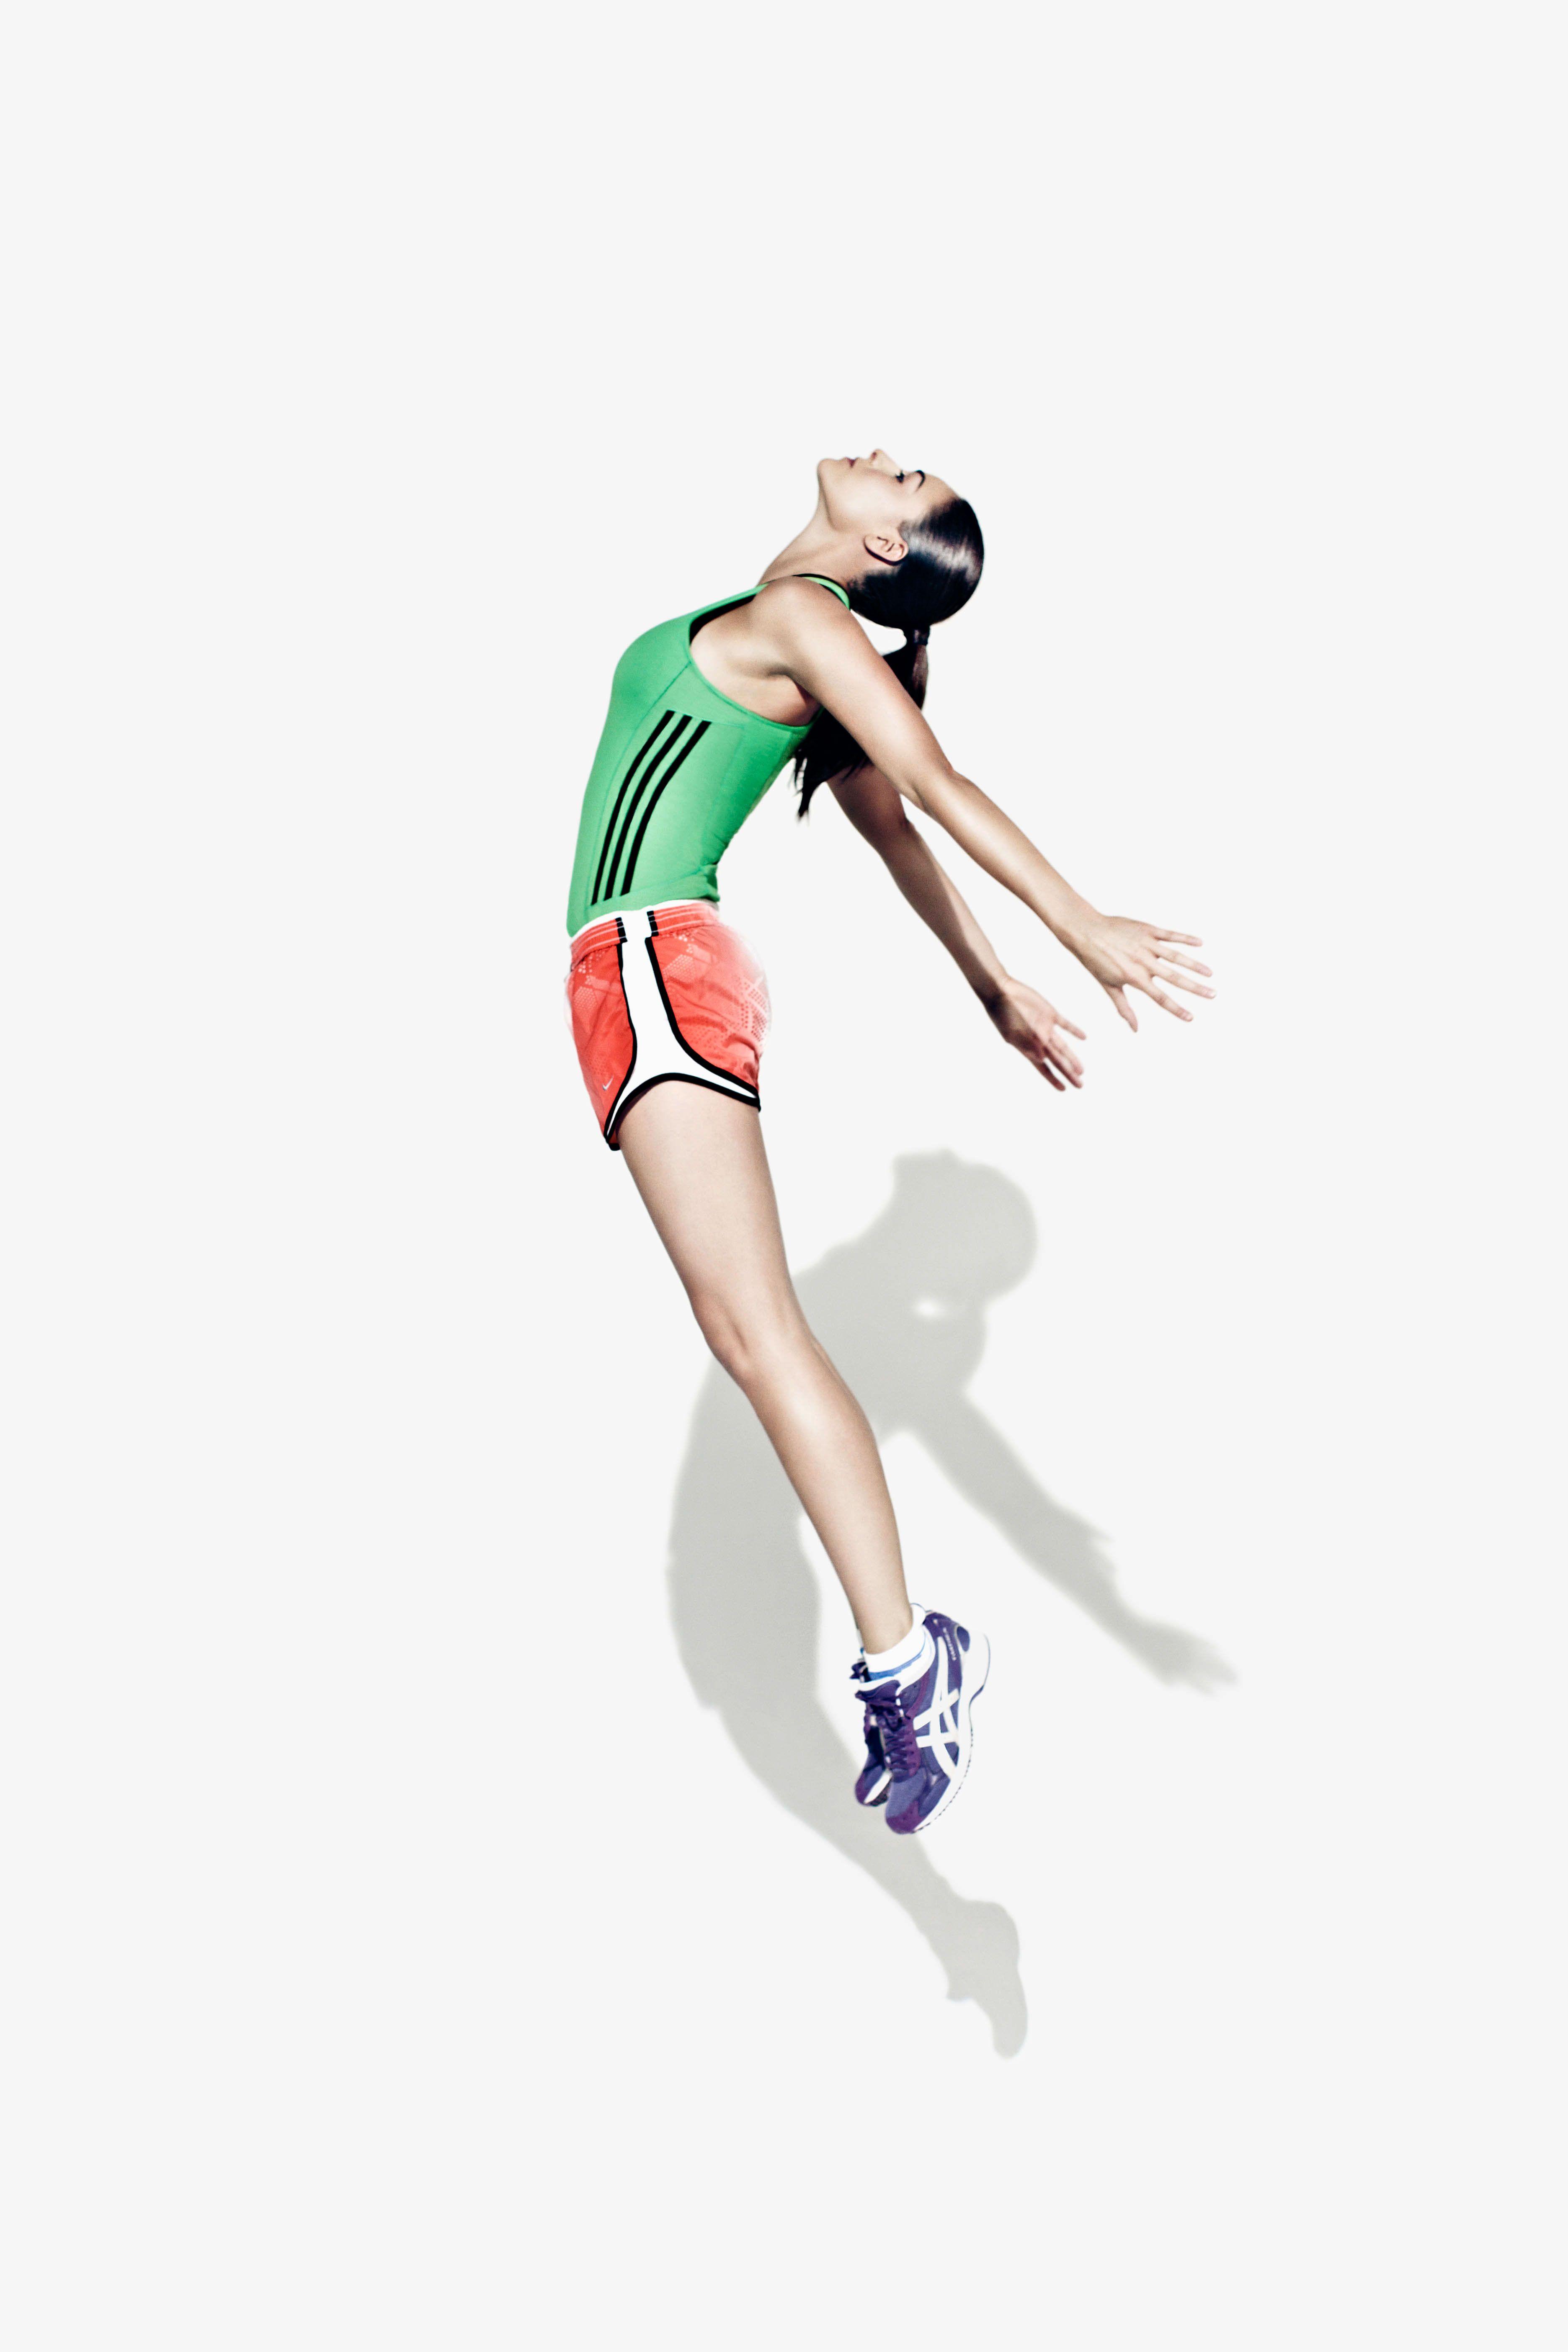 Editorial Shoot For Health Fitness Magazine To Show The Modern Chic Female Everyday Runner Fitness Portrait Sports Female Runner